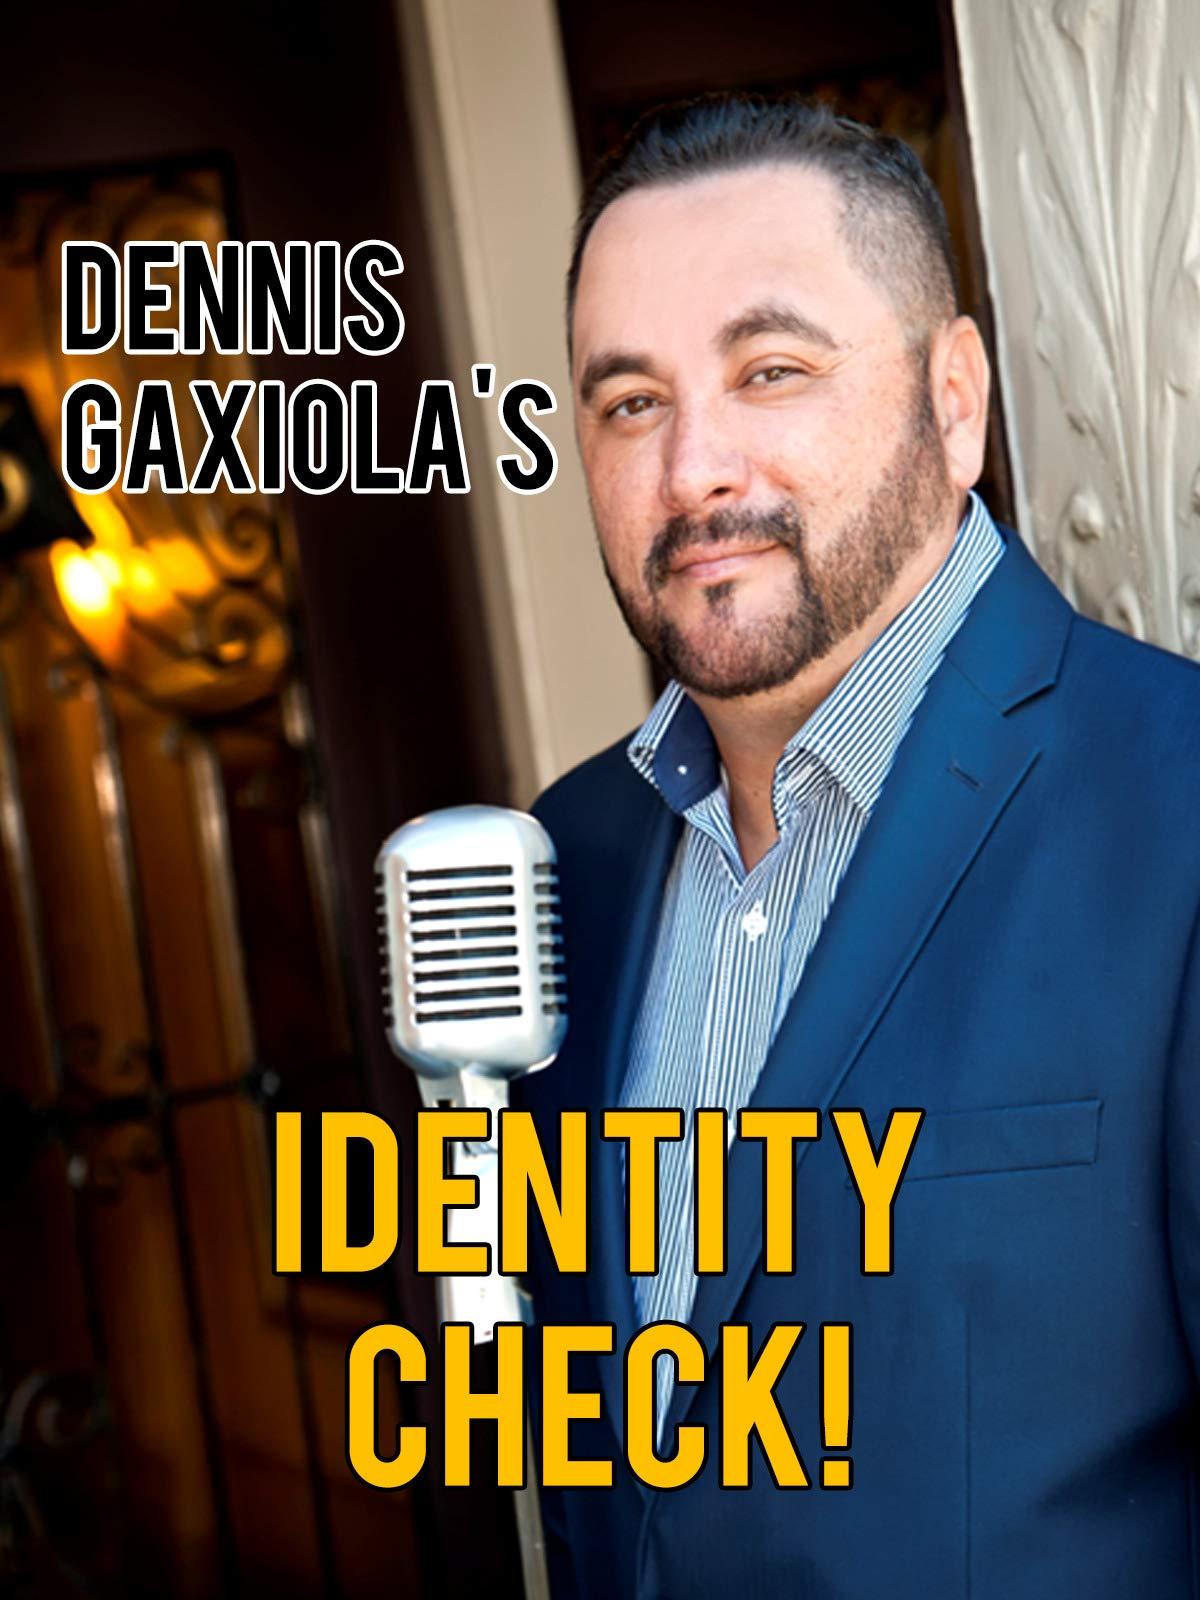 Dennis Gaxiolia's Identity Check